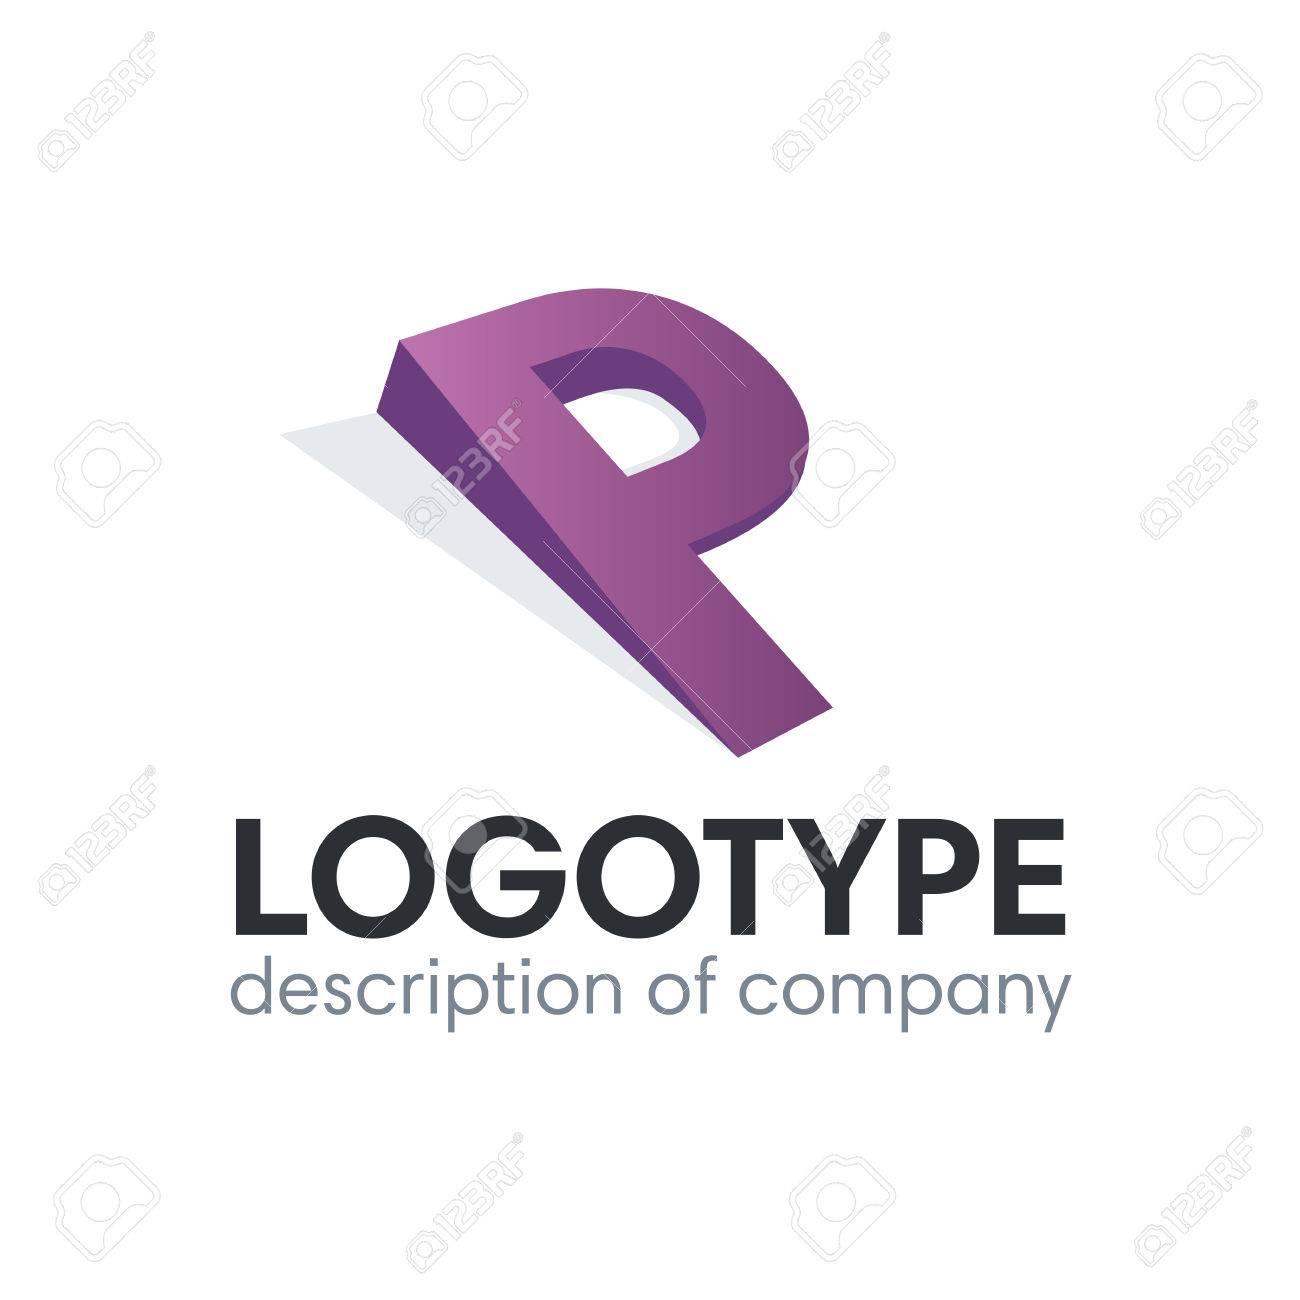 Letter P logo icon design template elements - 84049337